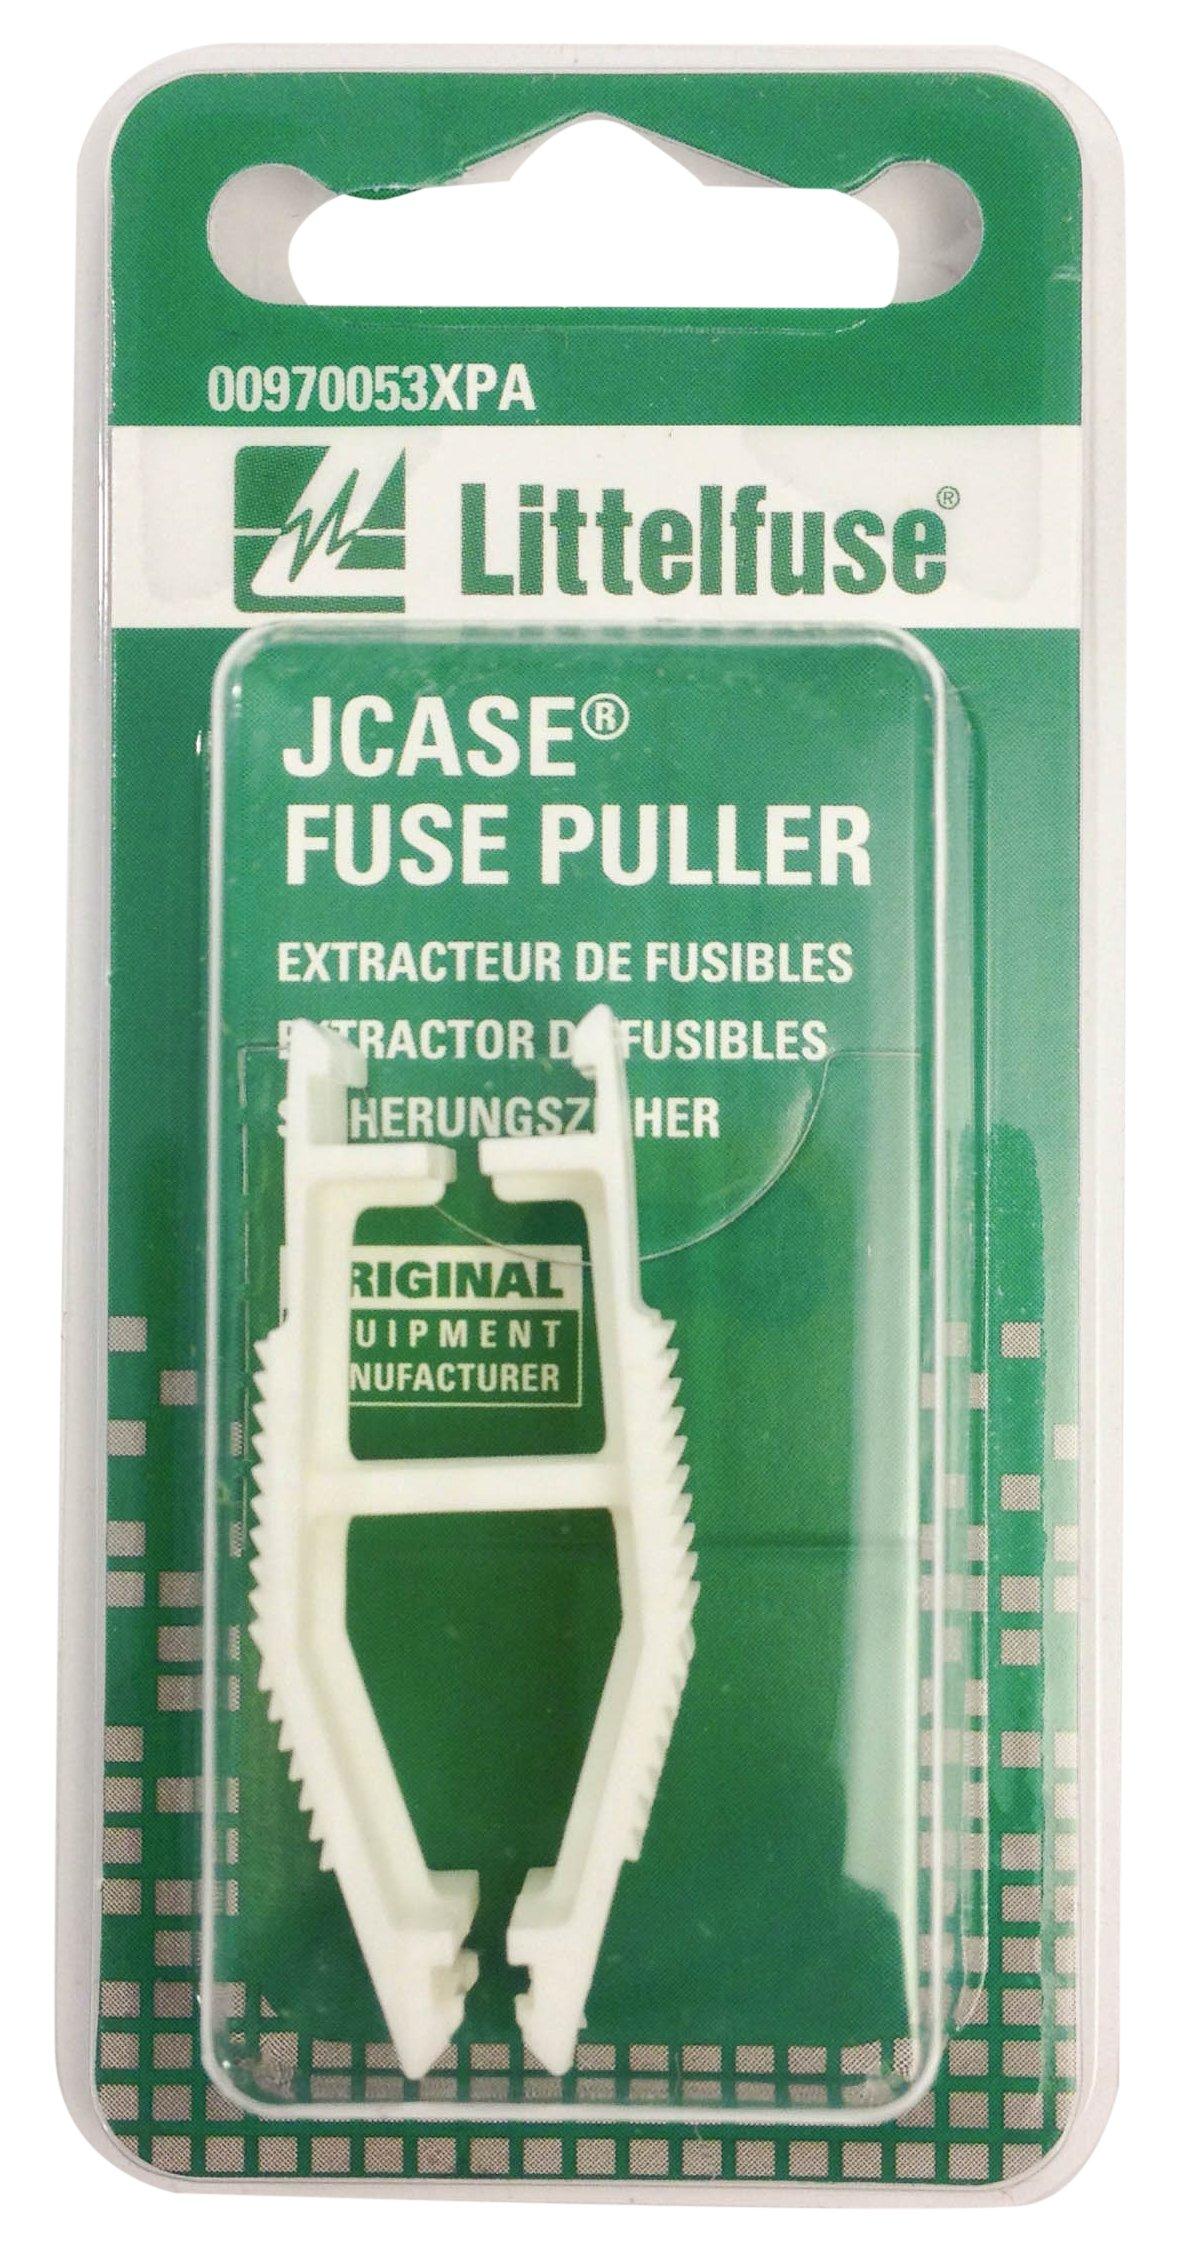 Littelfuse 00970053XP For JCase Fuses